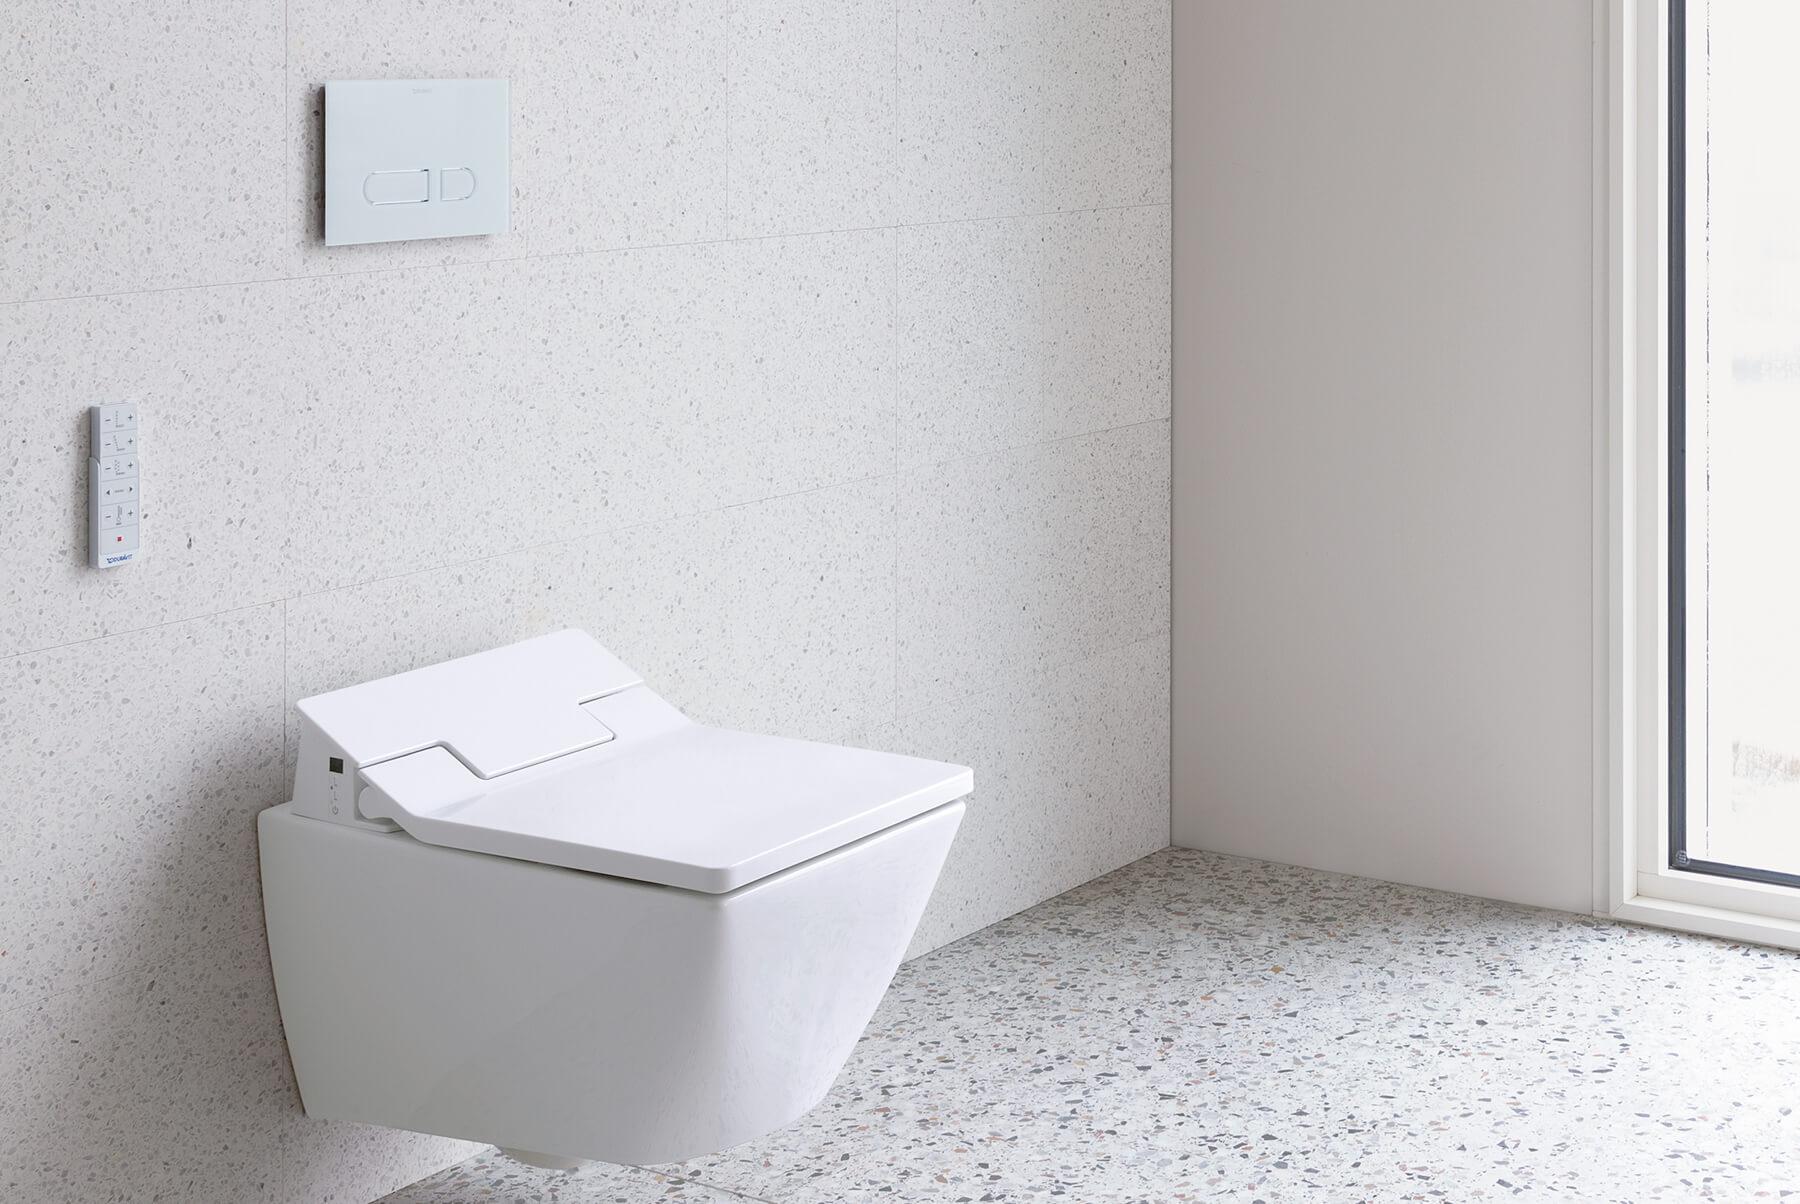 WC-&-WASHLETS-Duravit-SensoWash-INSET-2-1800x1204